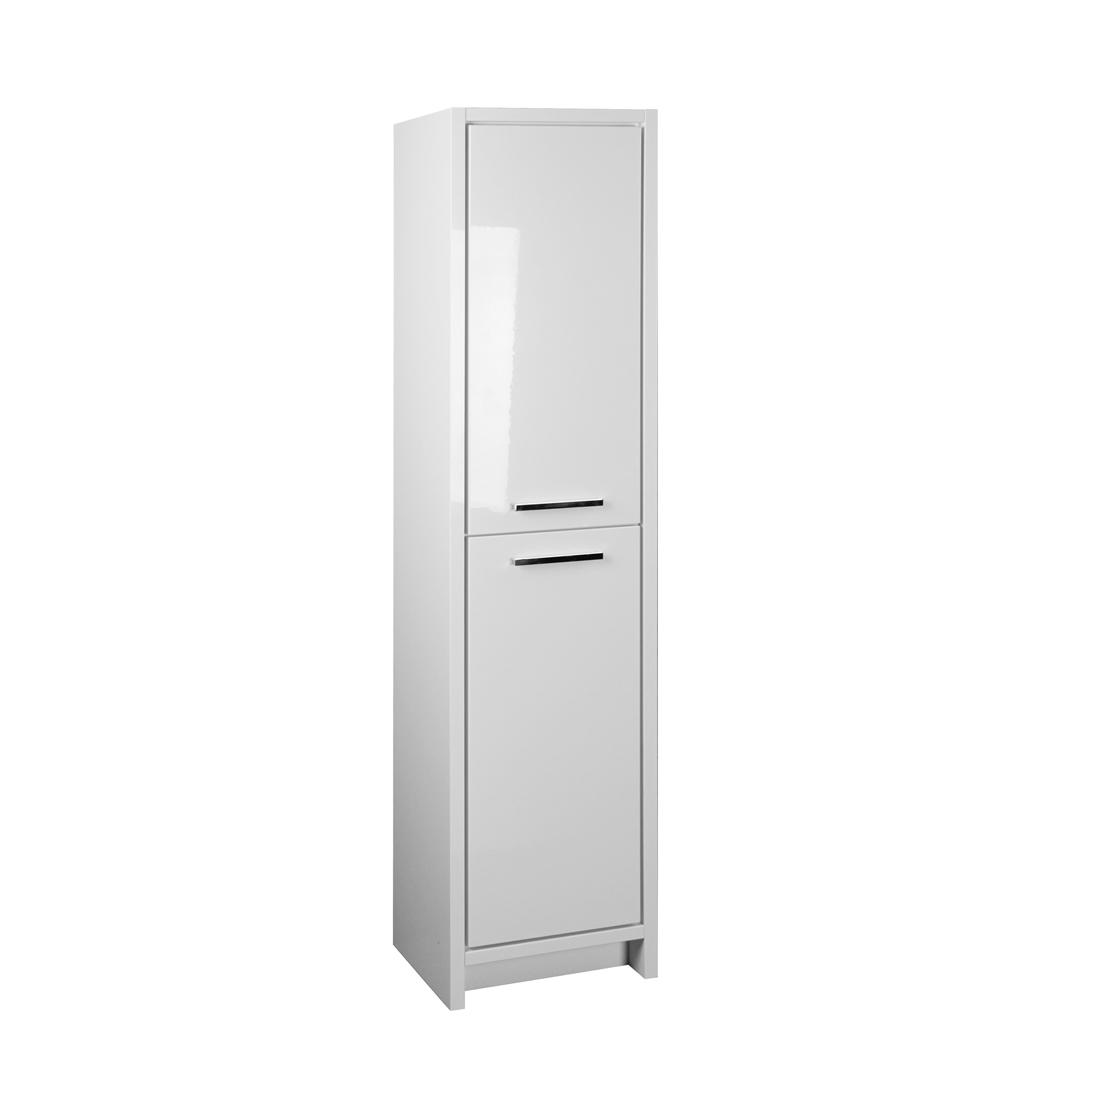 Romali 2.0 White Linen cabinet front view